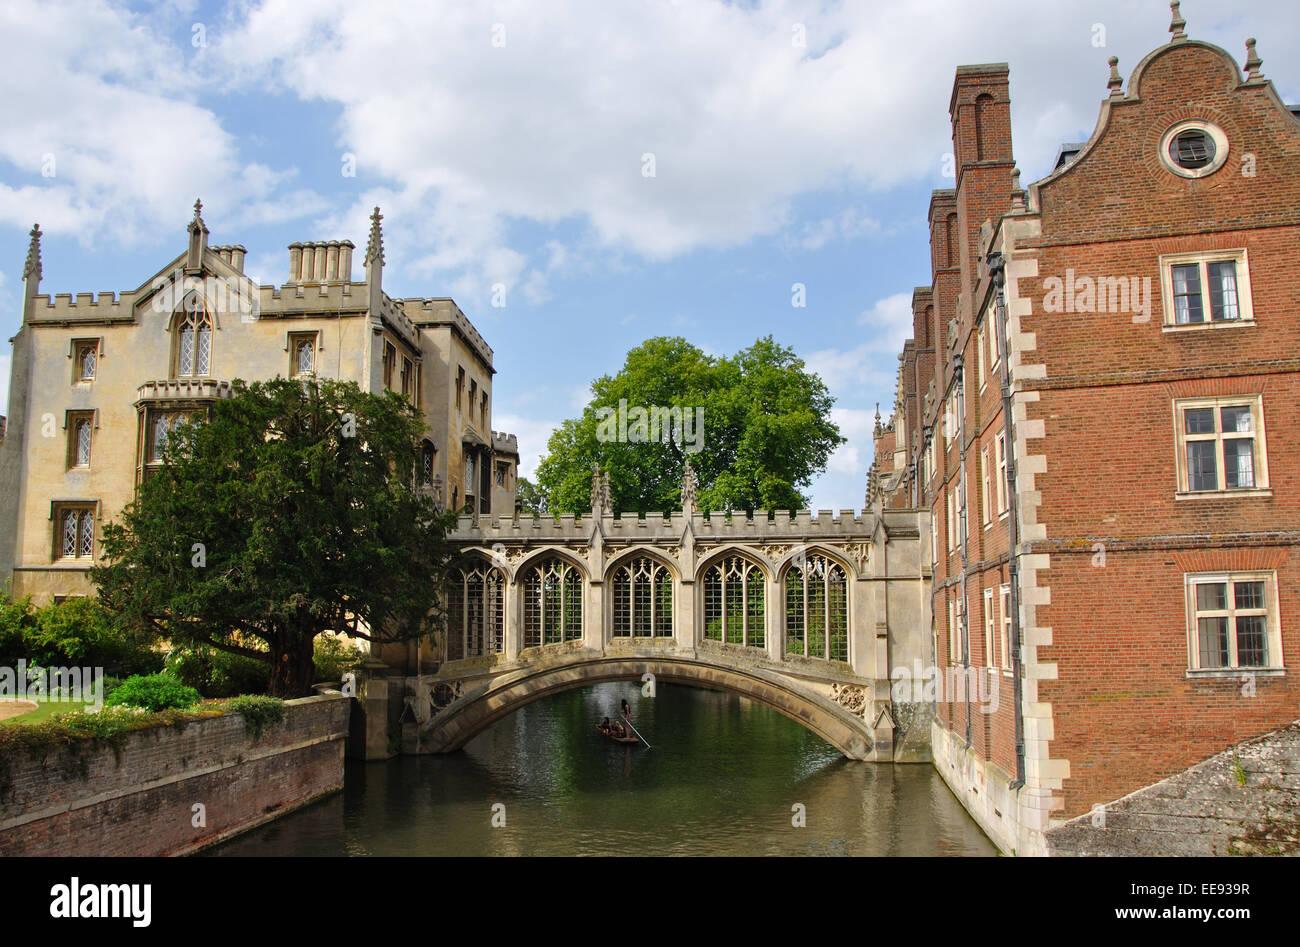 Bridge of Sighs, St John's College, Cambridge, England, UK - Stock Image